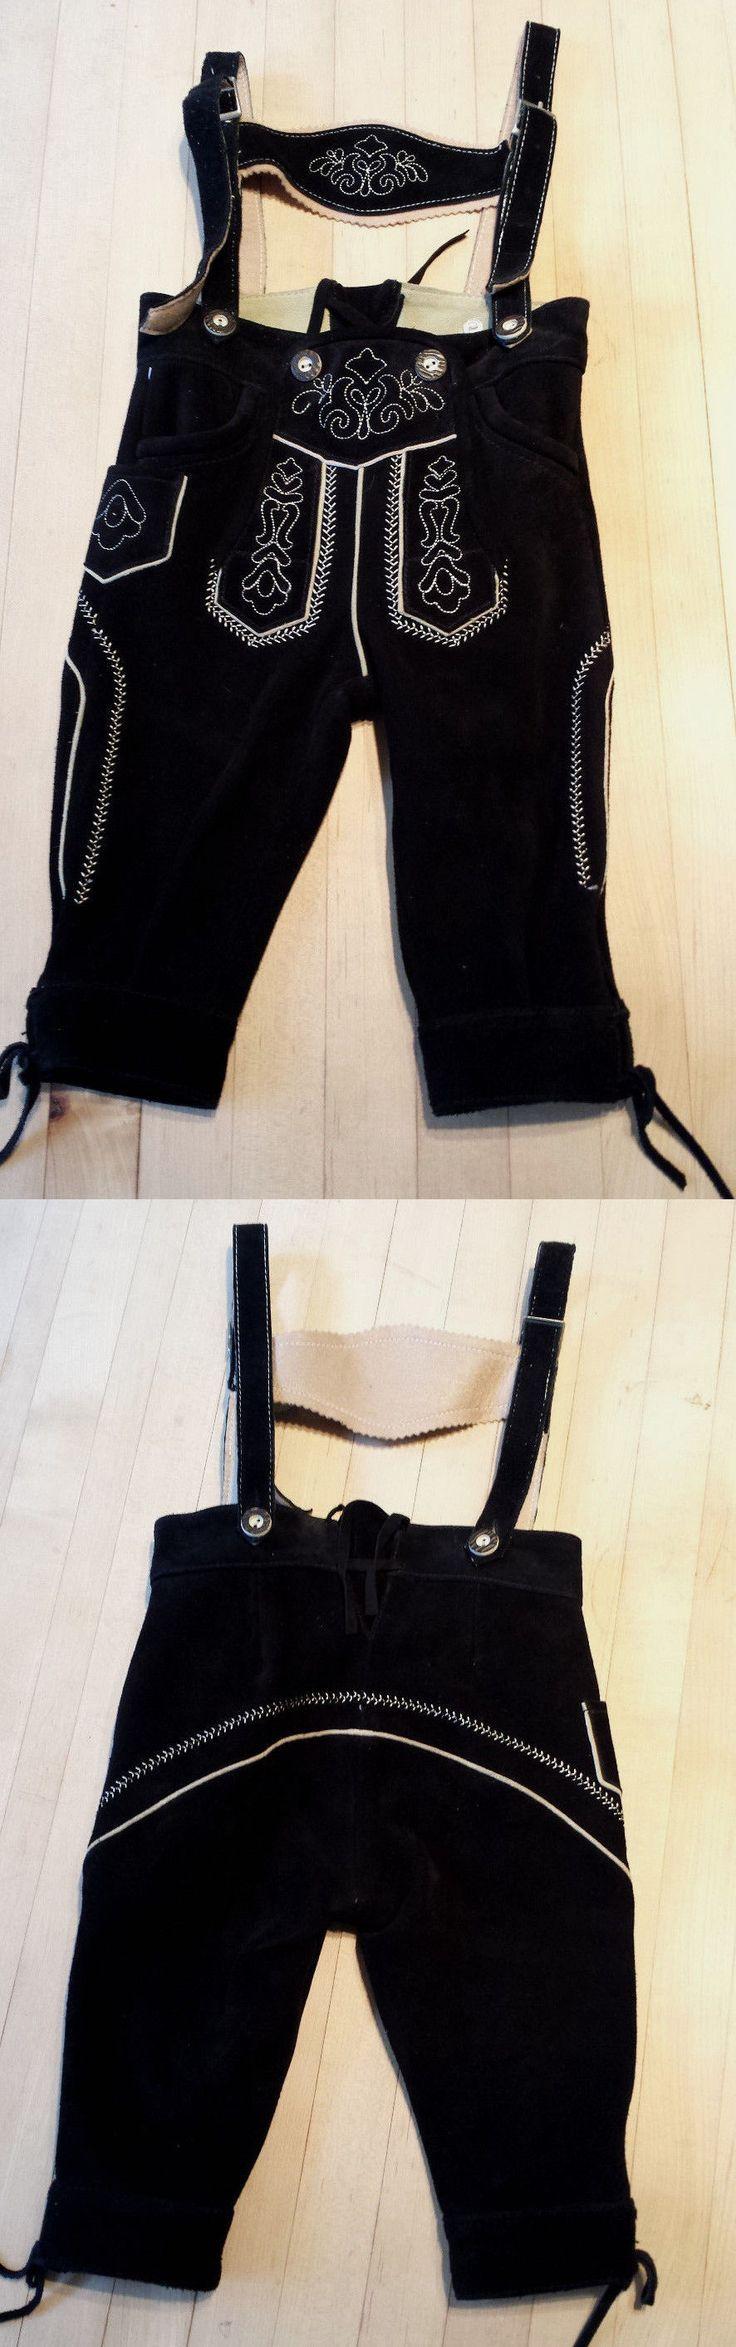 Lederhosen 163144: New Authentic German Boys Black Lederhosen Leather Pants With Suspenders -> BUY IT NOW ONLY: $44.99 on eBay!